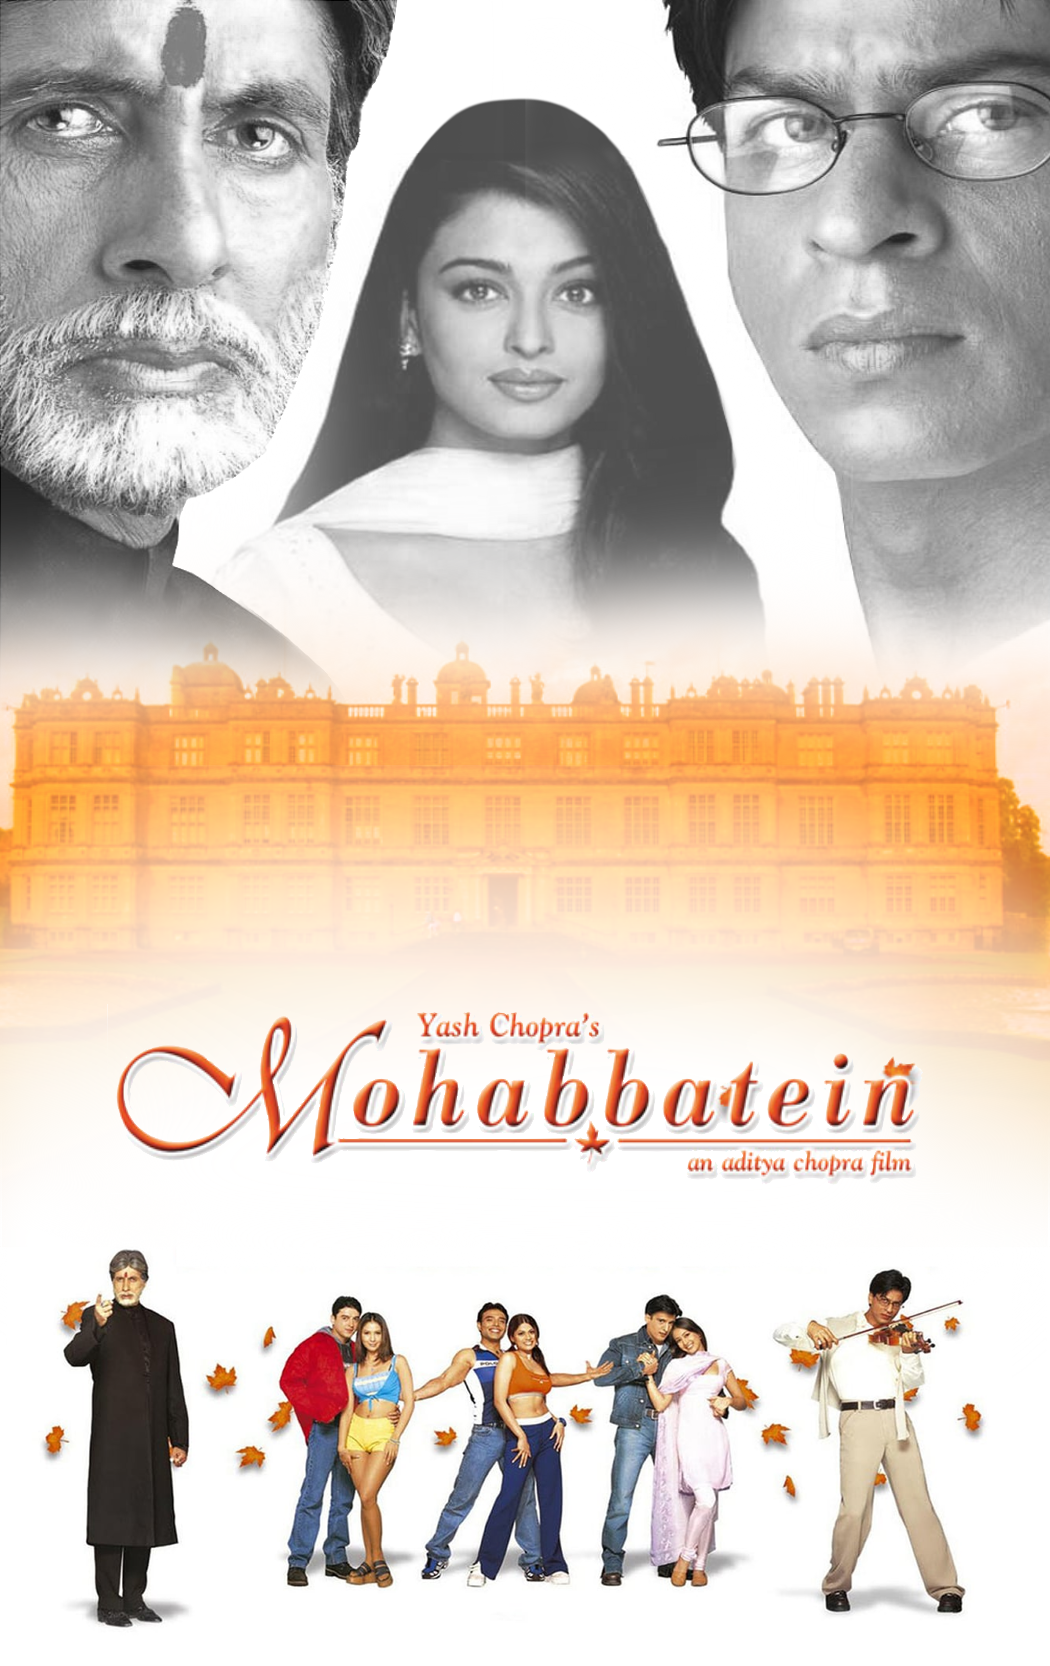 Mohabbatein Poster Beautiful Wedding Reception Wedding Marketing Urban Wedding Venue